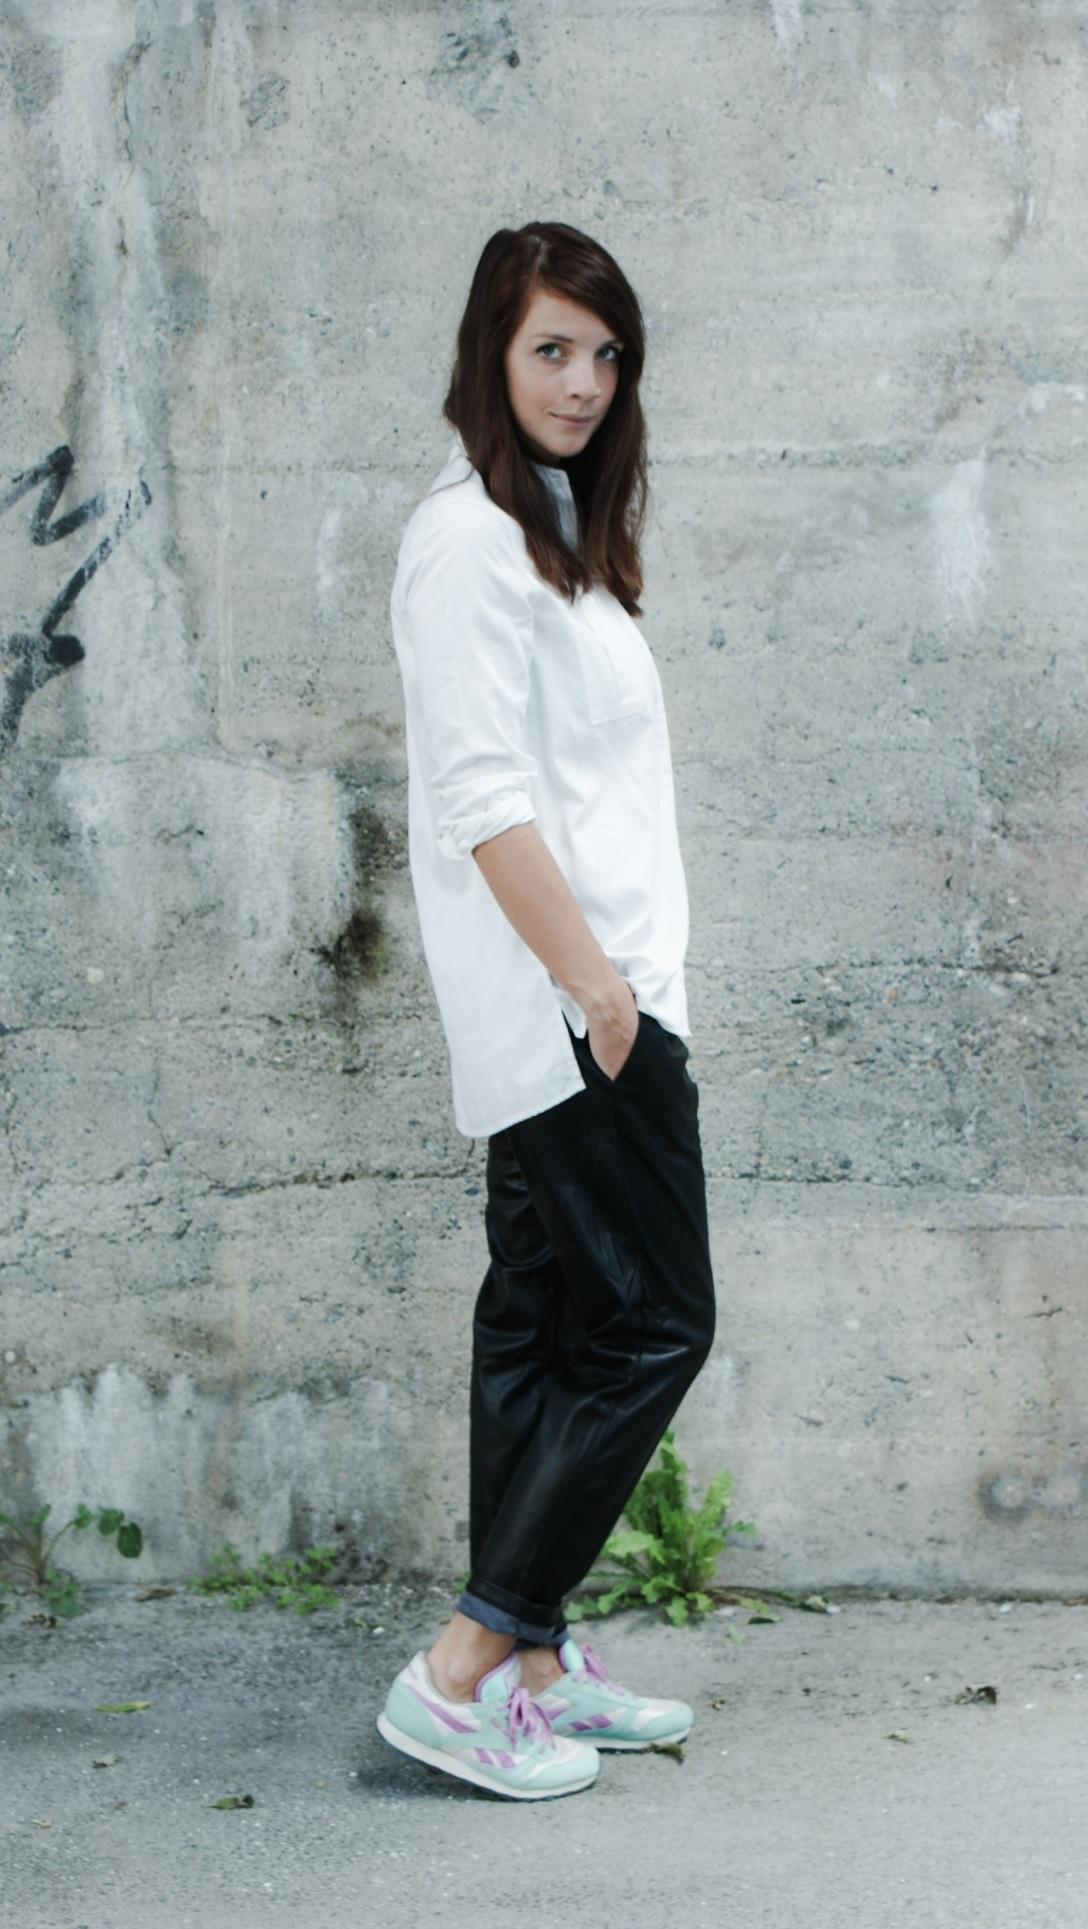 michael kors watch trend fashion streetstyle lookbook outfit zara portrait leather pants